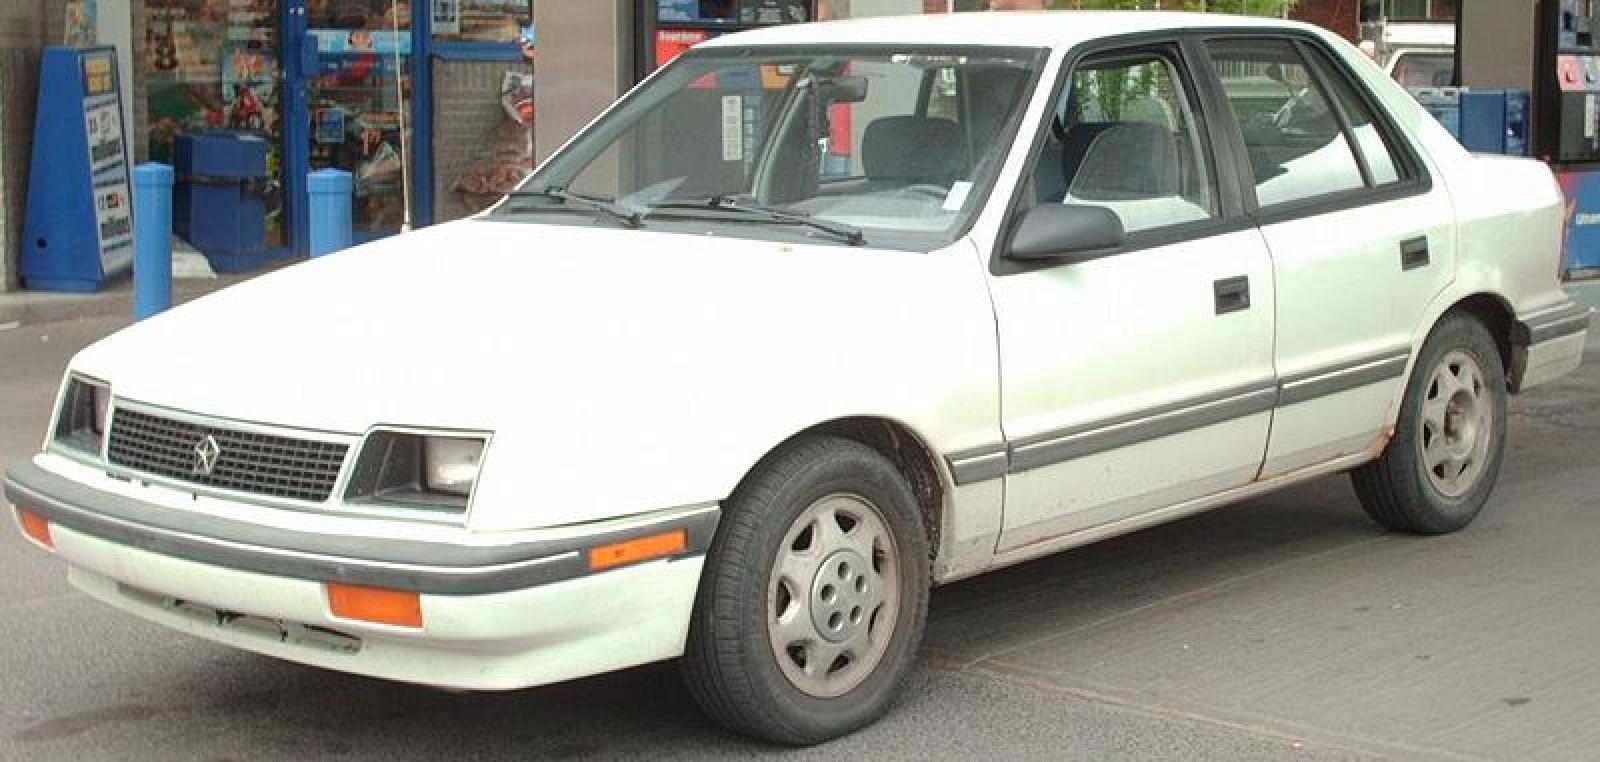 1991 Dodge Shadow Fuse Box Diagram Library Of Wiring Diagrams 1990 Dakota Plymouth Sundance Car U2022 Rh Suntse De 88 98 Caravan